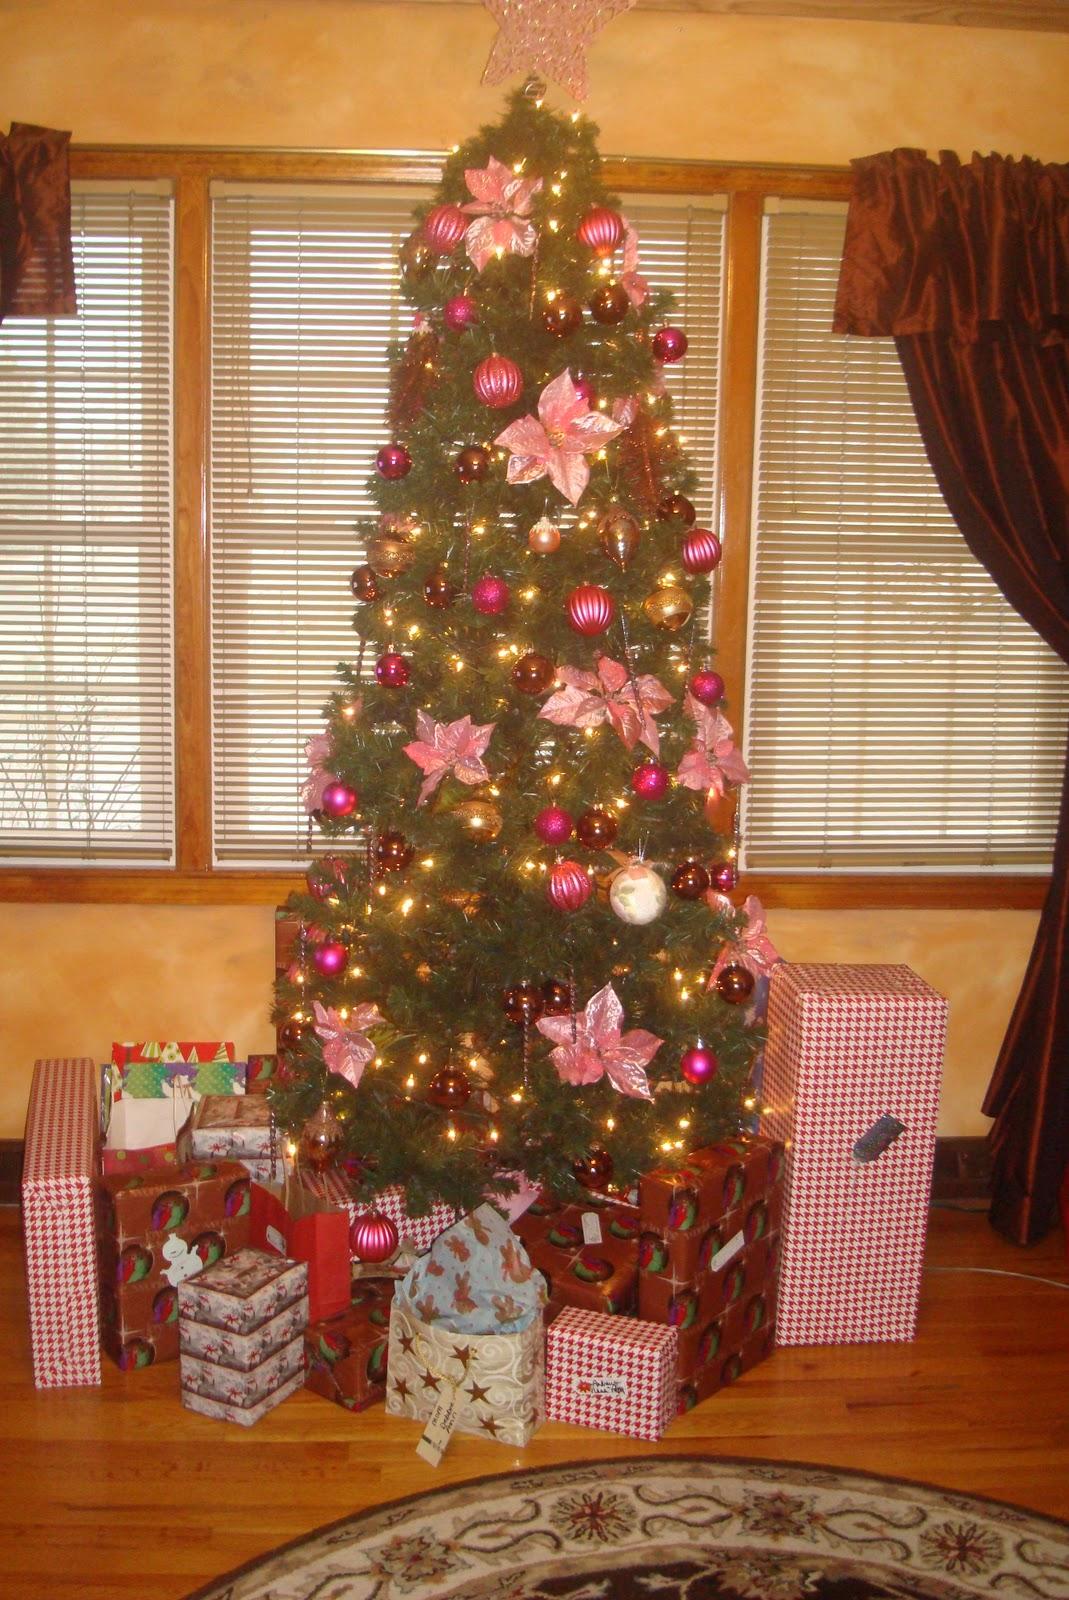 http://1.bp.blogspot.com/_b0MUvvce5Ow/TRS2tCyH2wI/AAAAAAAACgA/2W0IgaFMBww/s1600/tree+002.JPG